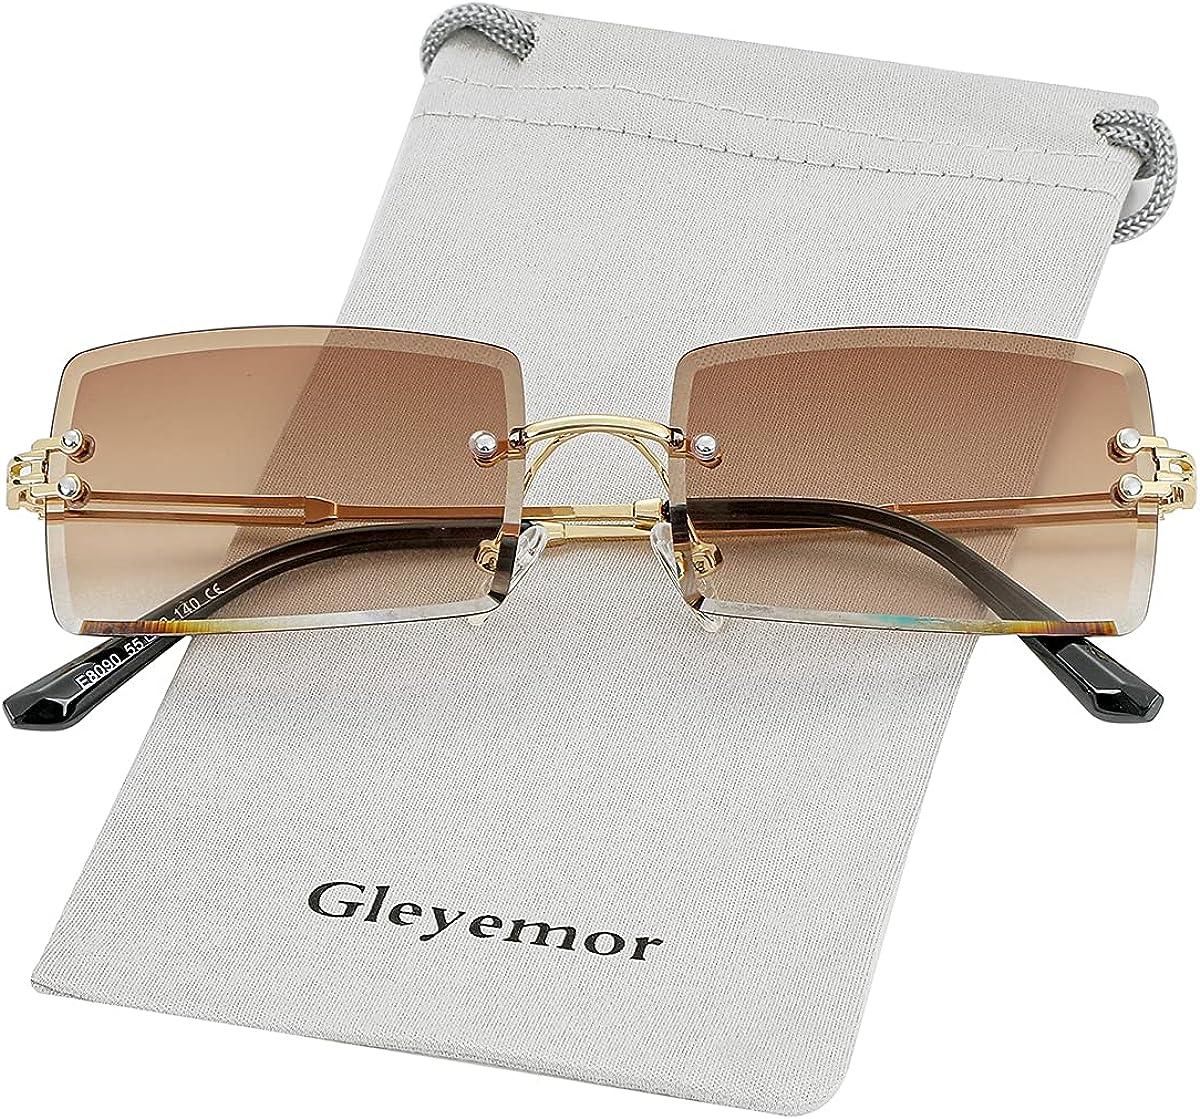 Ranking TOP1 Gleyemor Rimless Rectangle Sunglasses Max 64% OFF for Men Women Fashion Fram